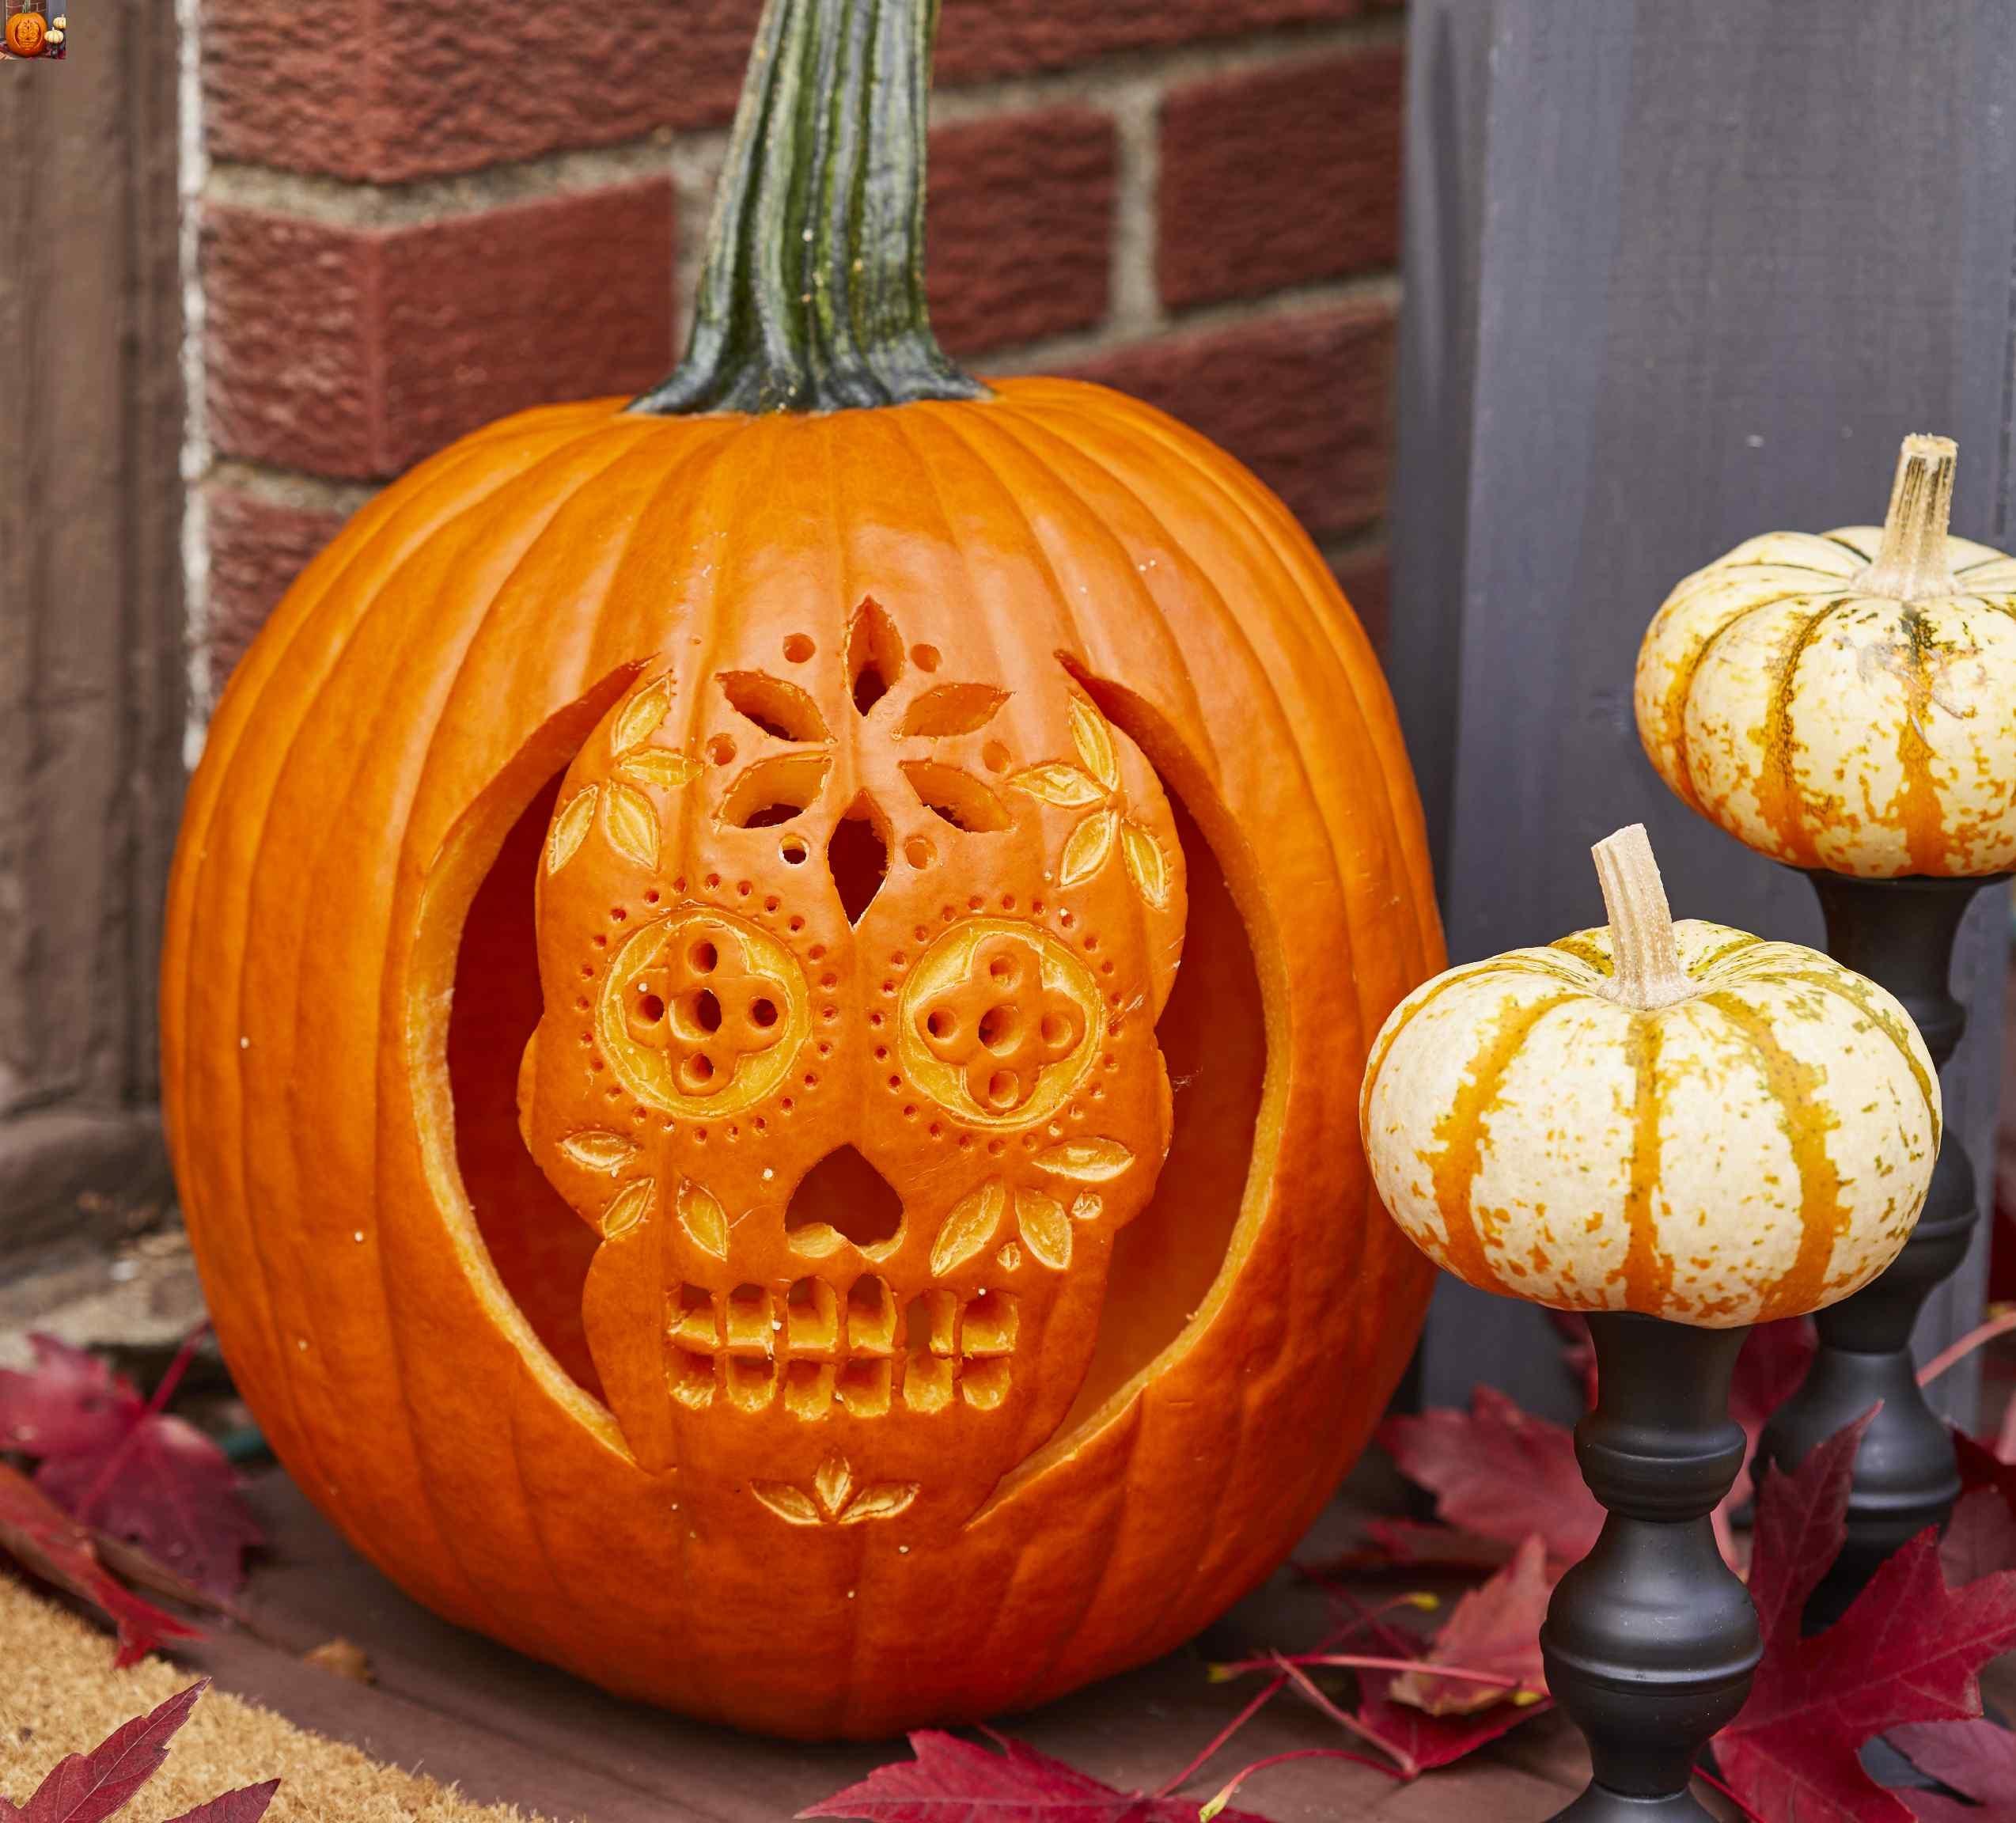 Zombie Pumpkin Stencil   Better Homes & Gardens - Free Printable Zombie Pumpkin Carving Stencils